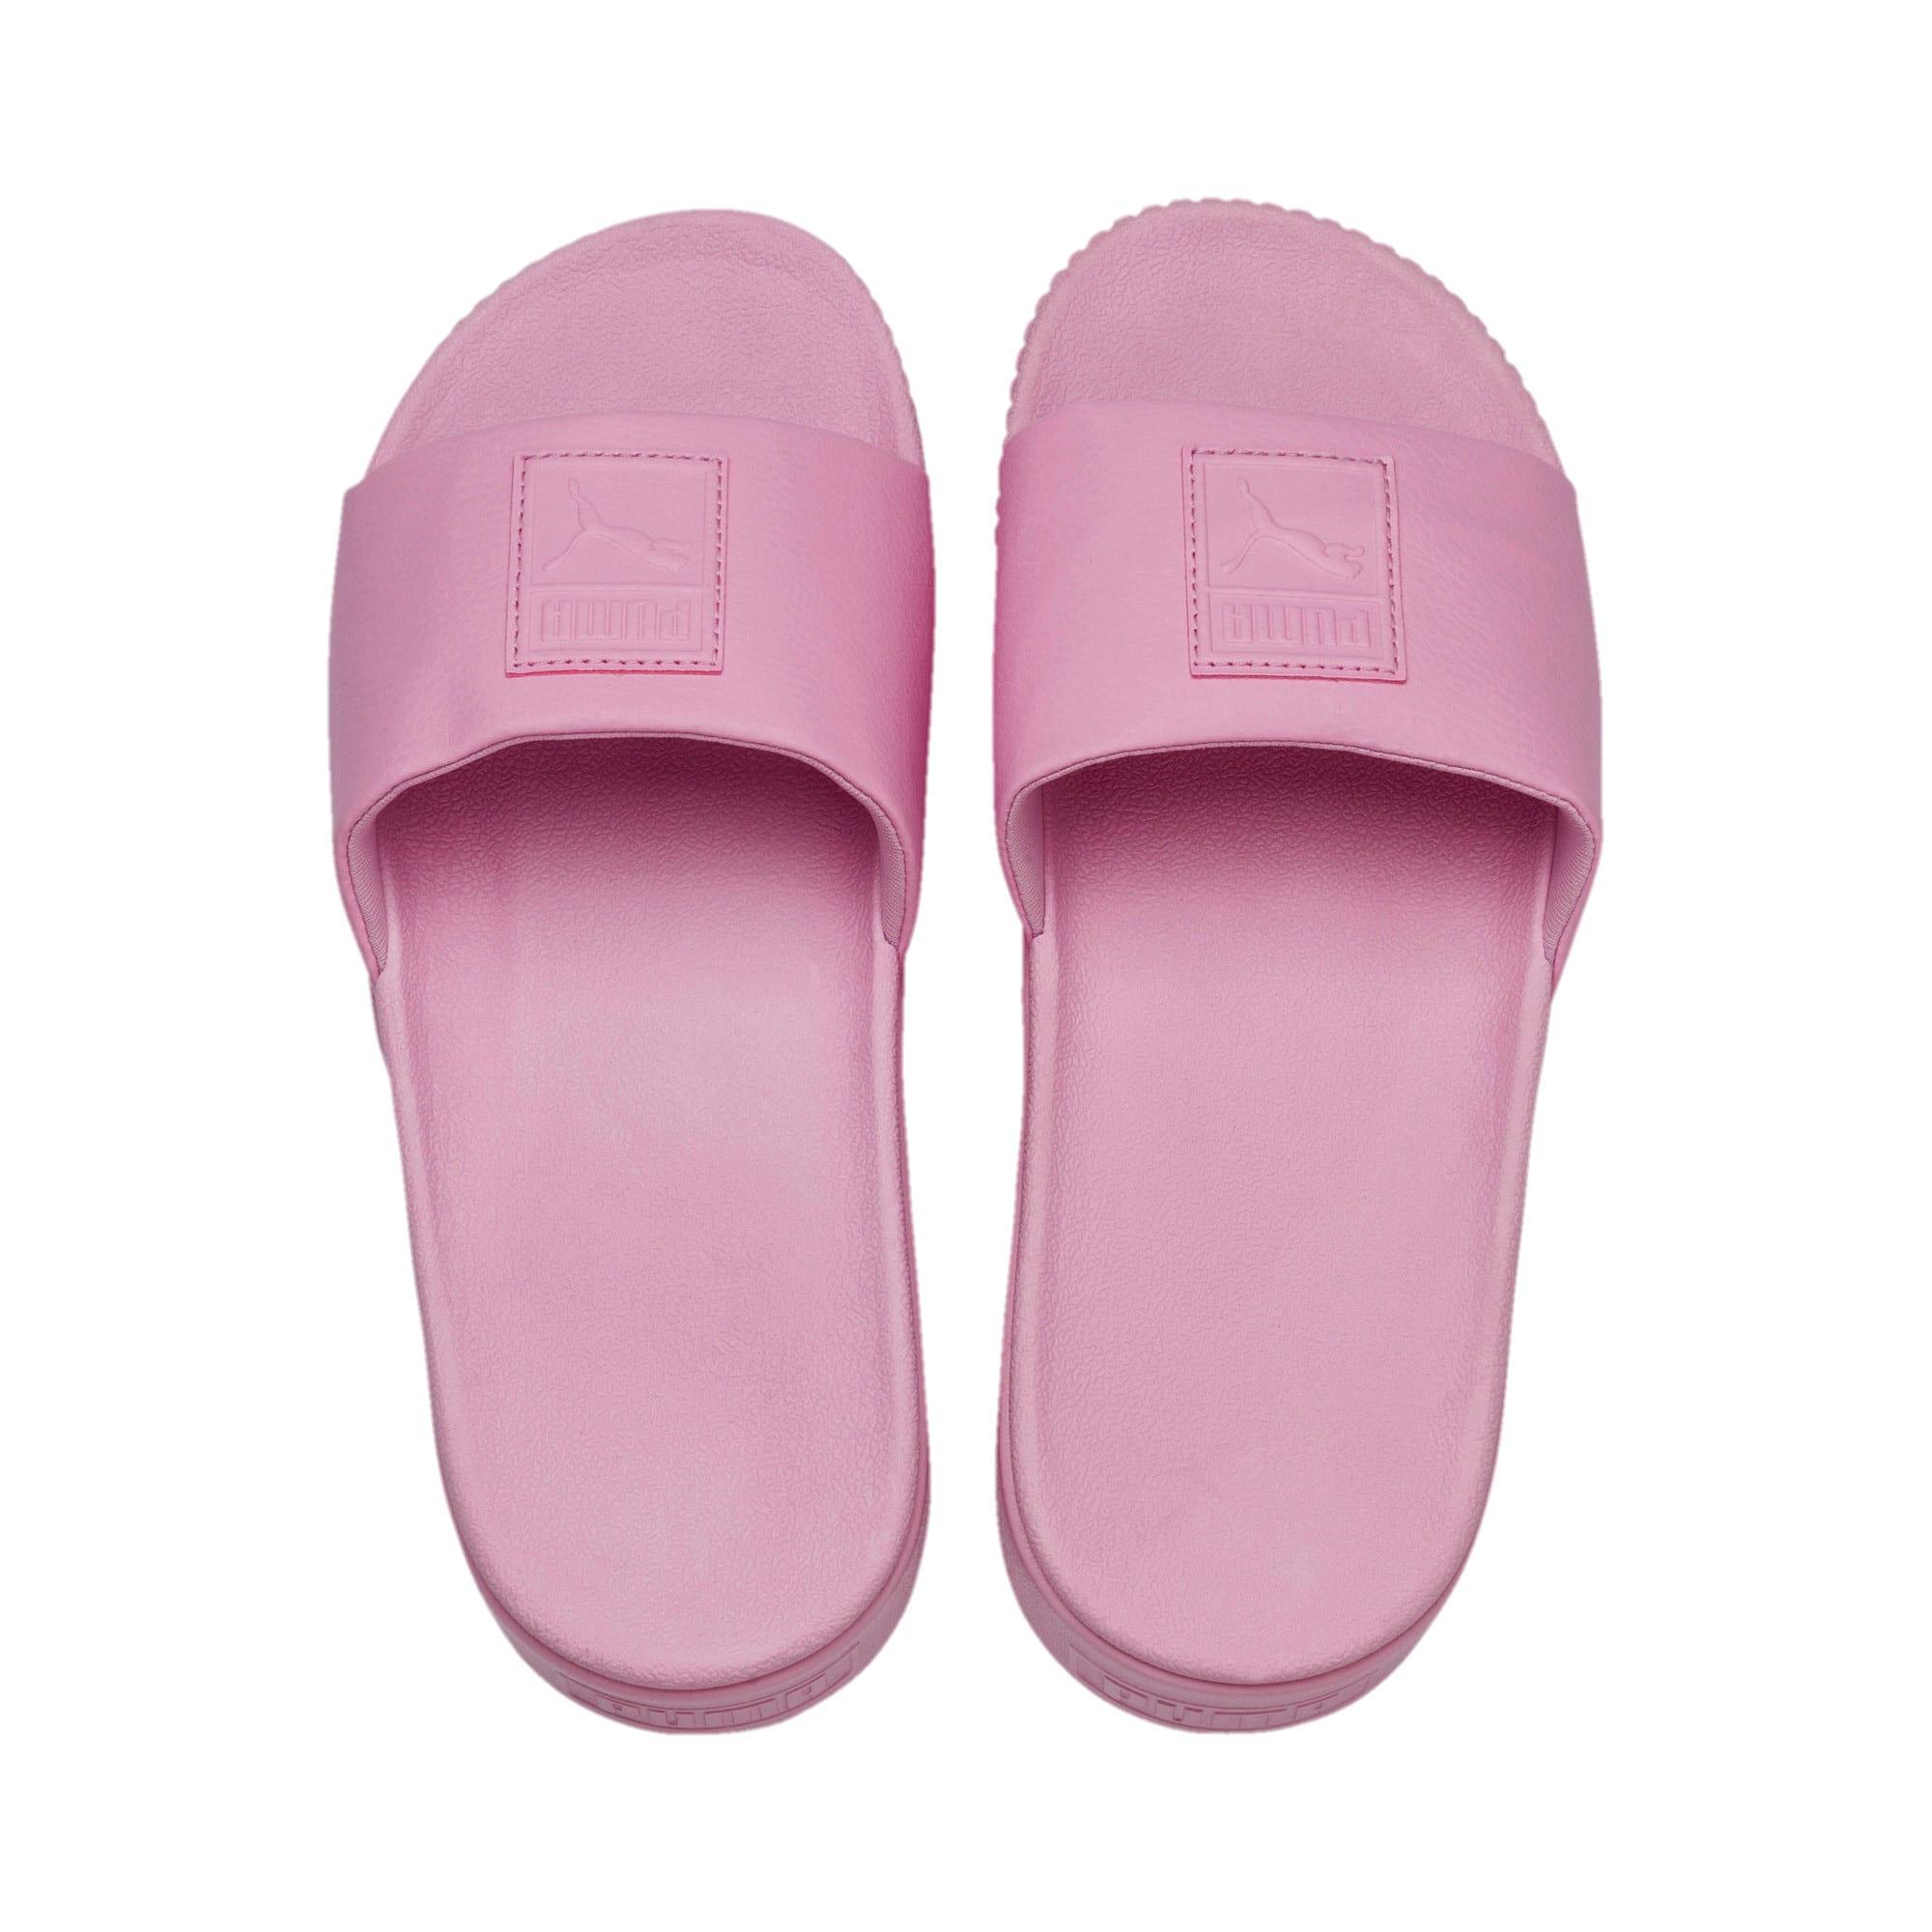 Thumbnail 6 of Platform Slide Women's Sandals, Pale Pink-Pale Pink, medium